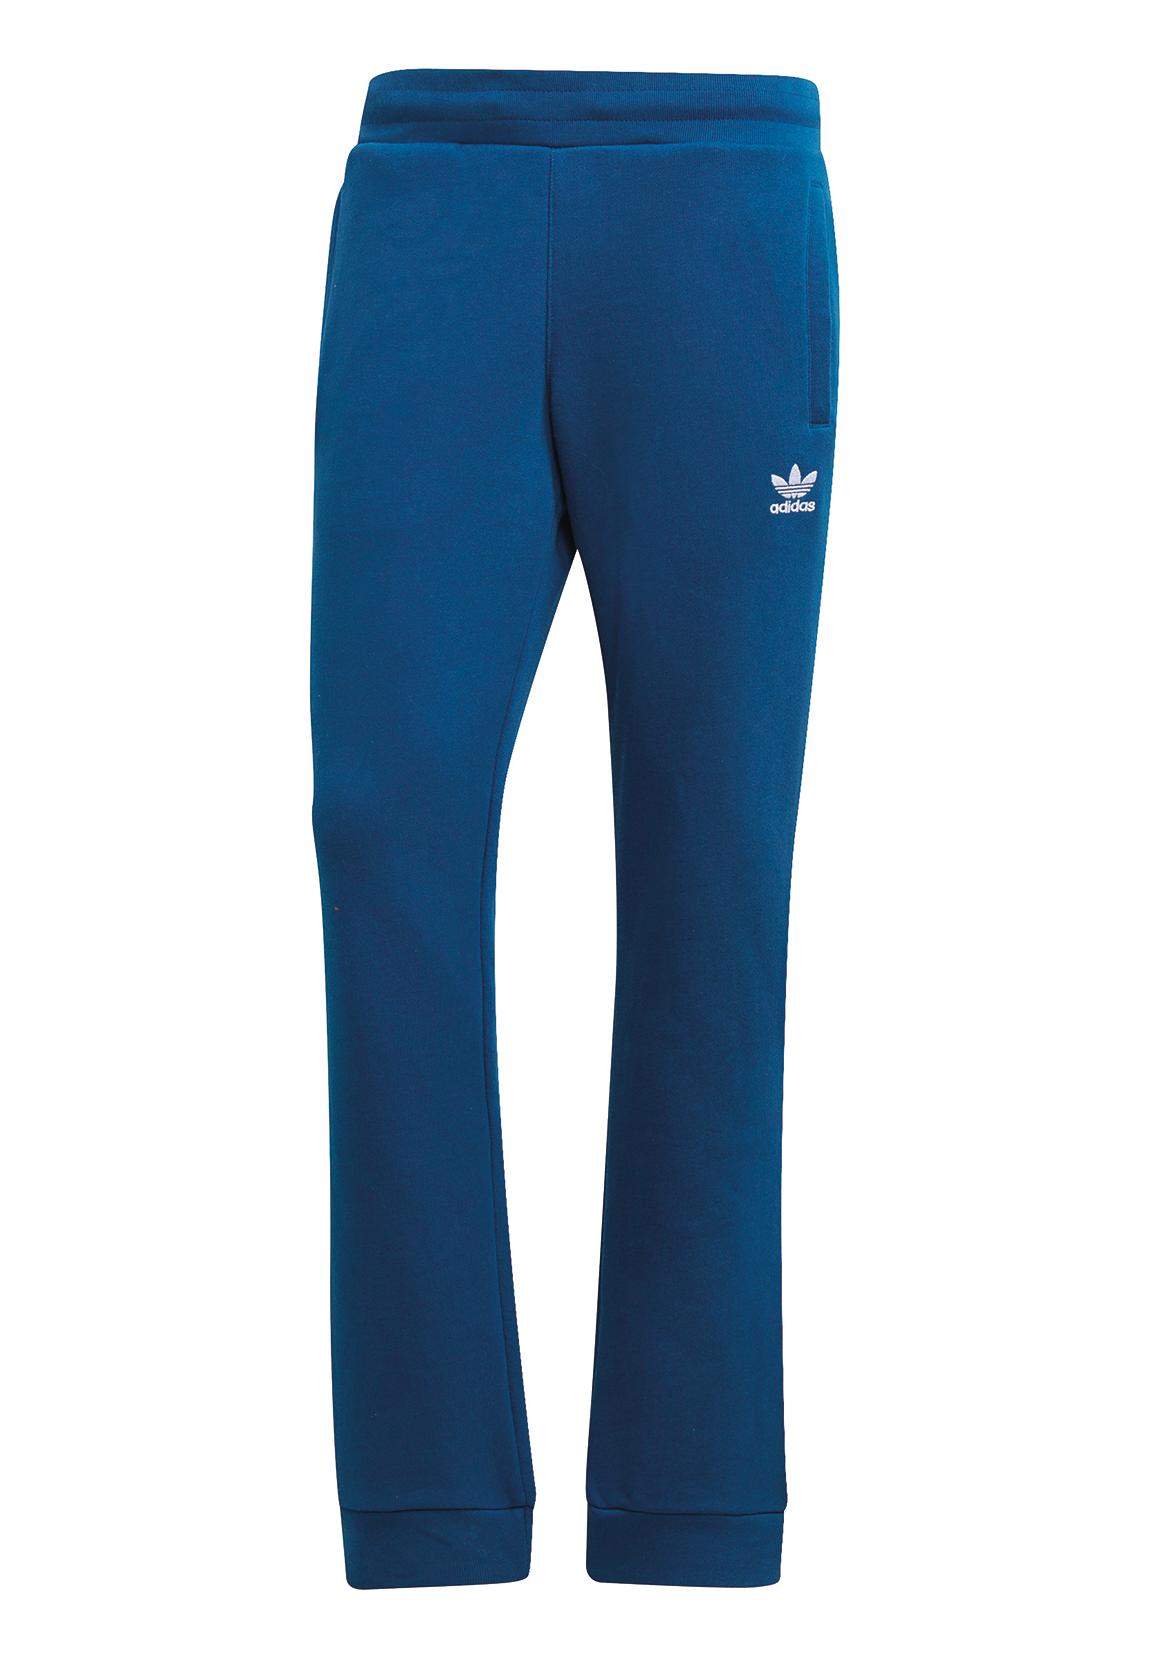 Pantalons Homme Neuf Adidas Pantalon De Survêtement Bleu